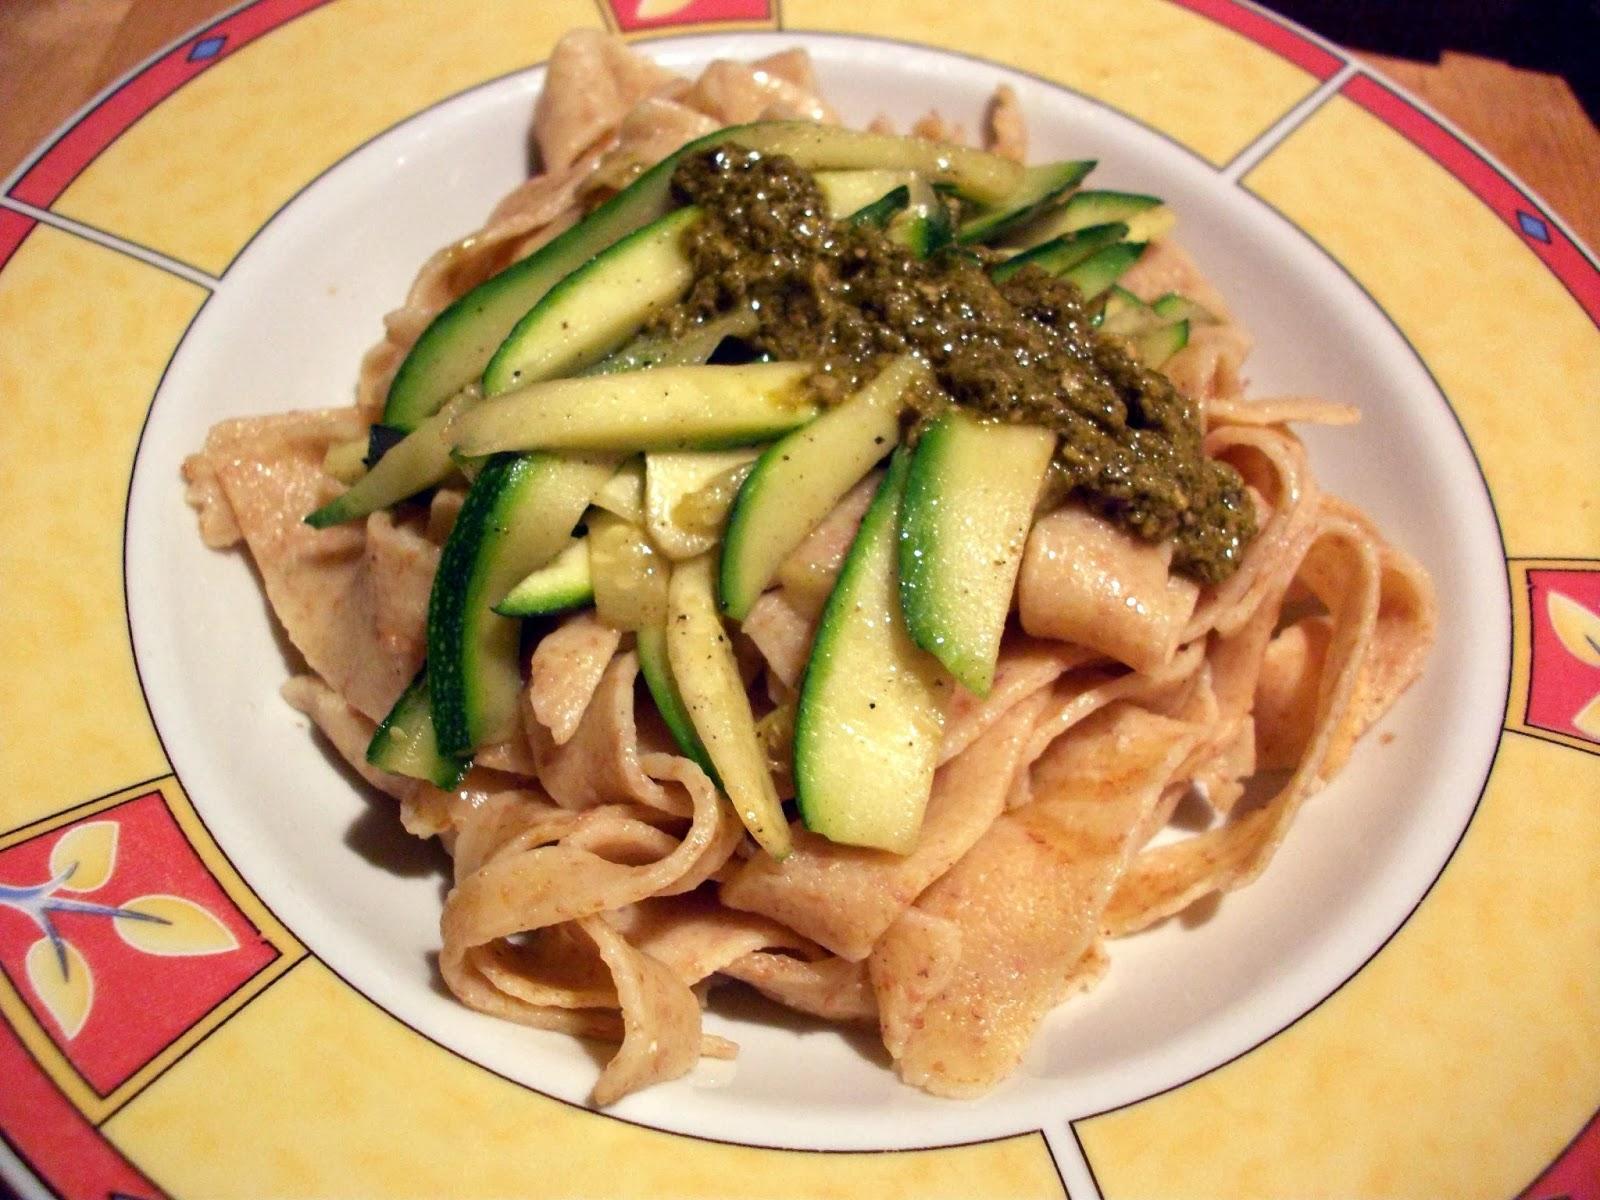 food_friday_homemade_wholegrain_pasta_3.JPG